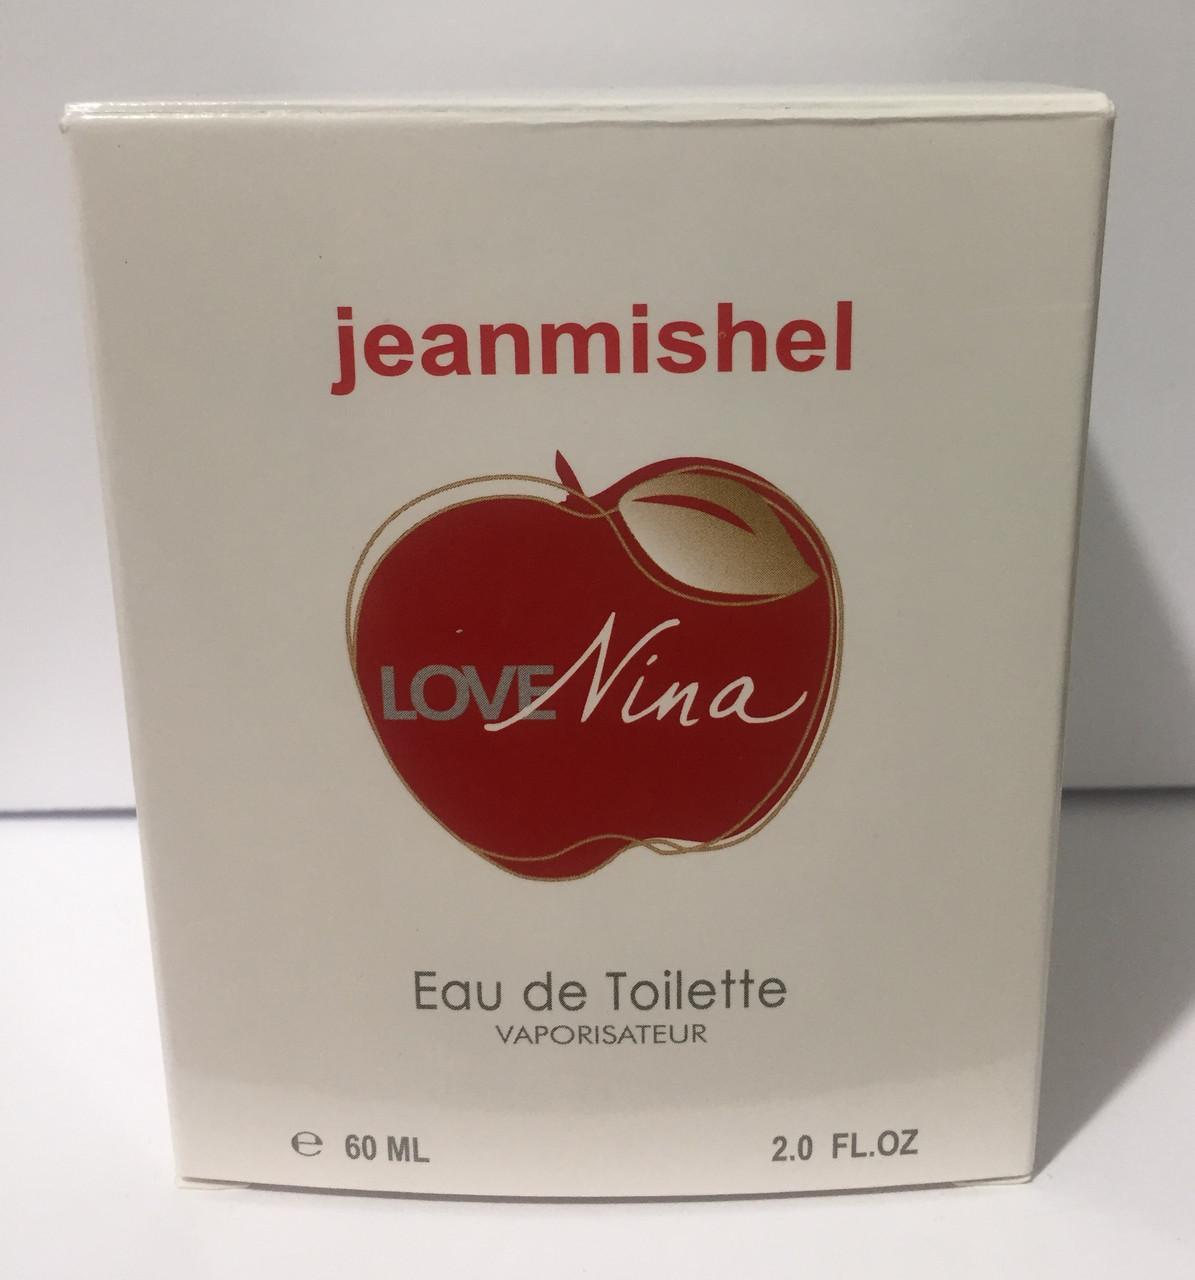 Тестер в подарочной упаковке jeanmishel love Nina 60 мл